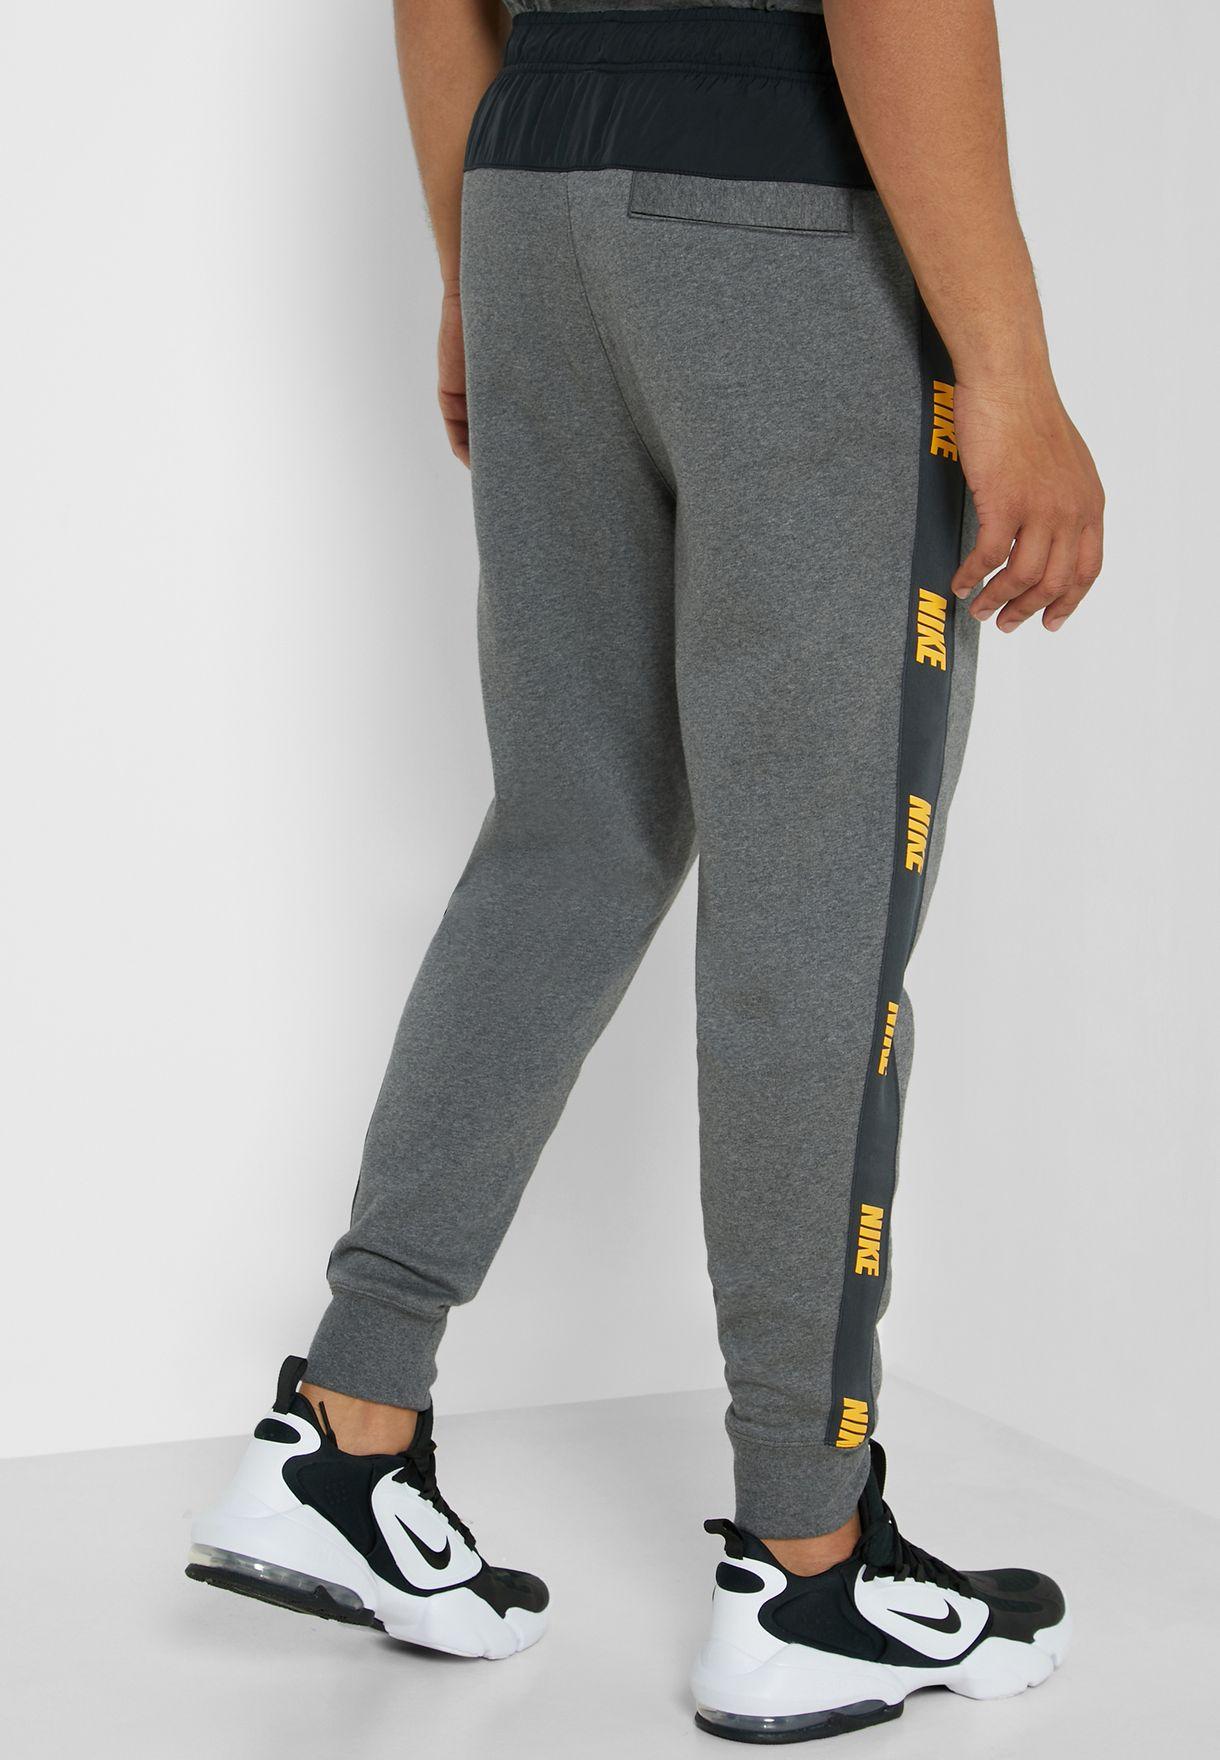 NSW Sweatpants